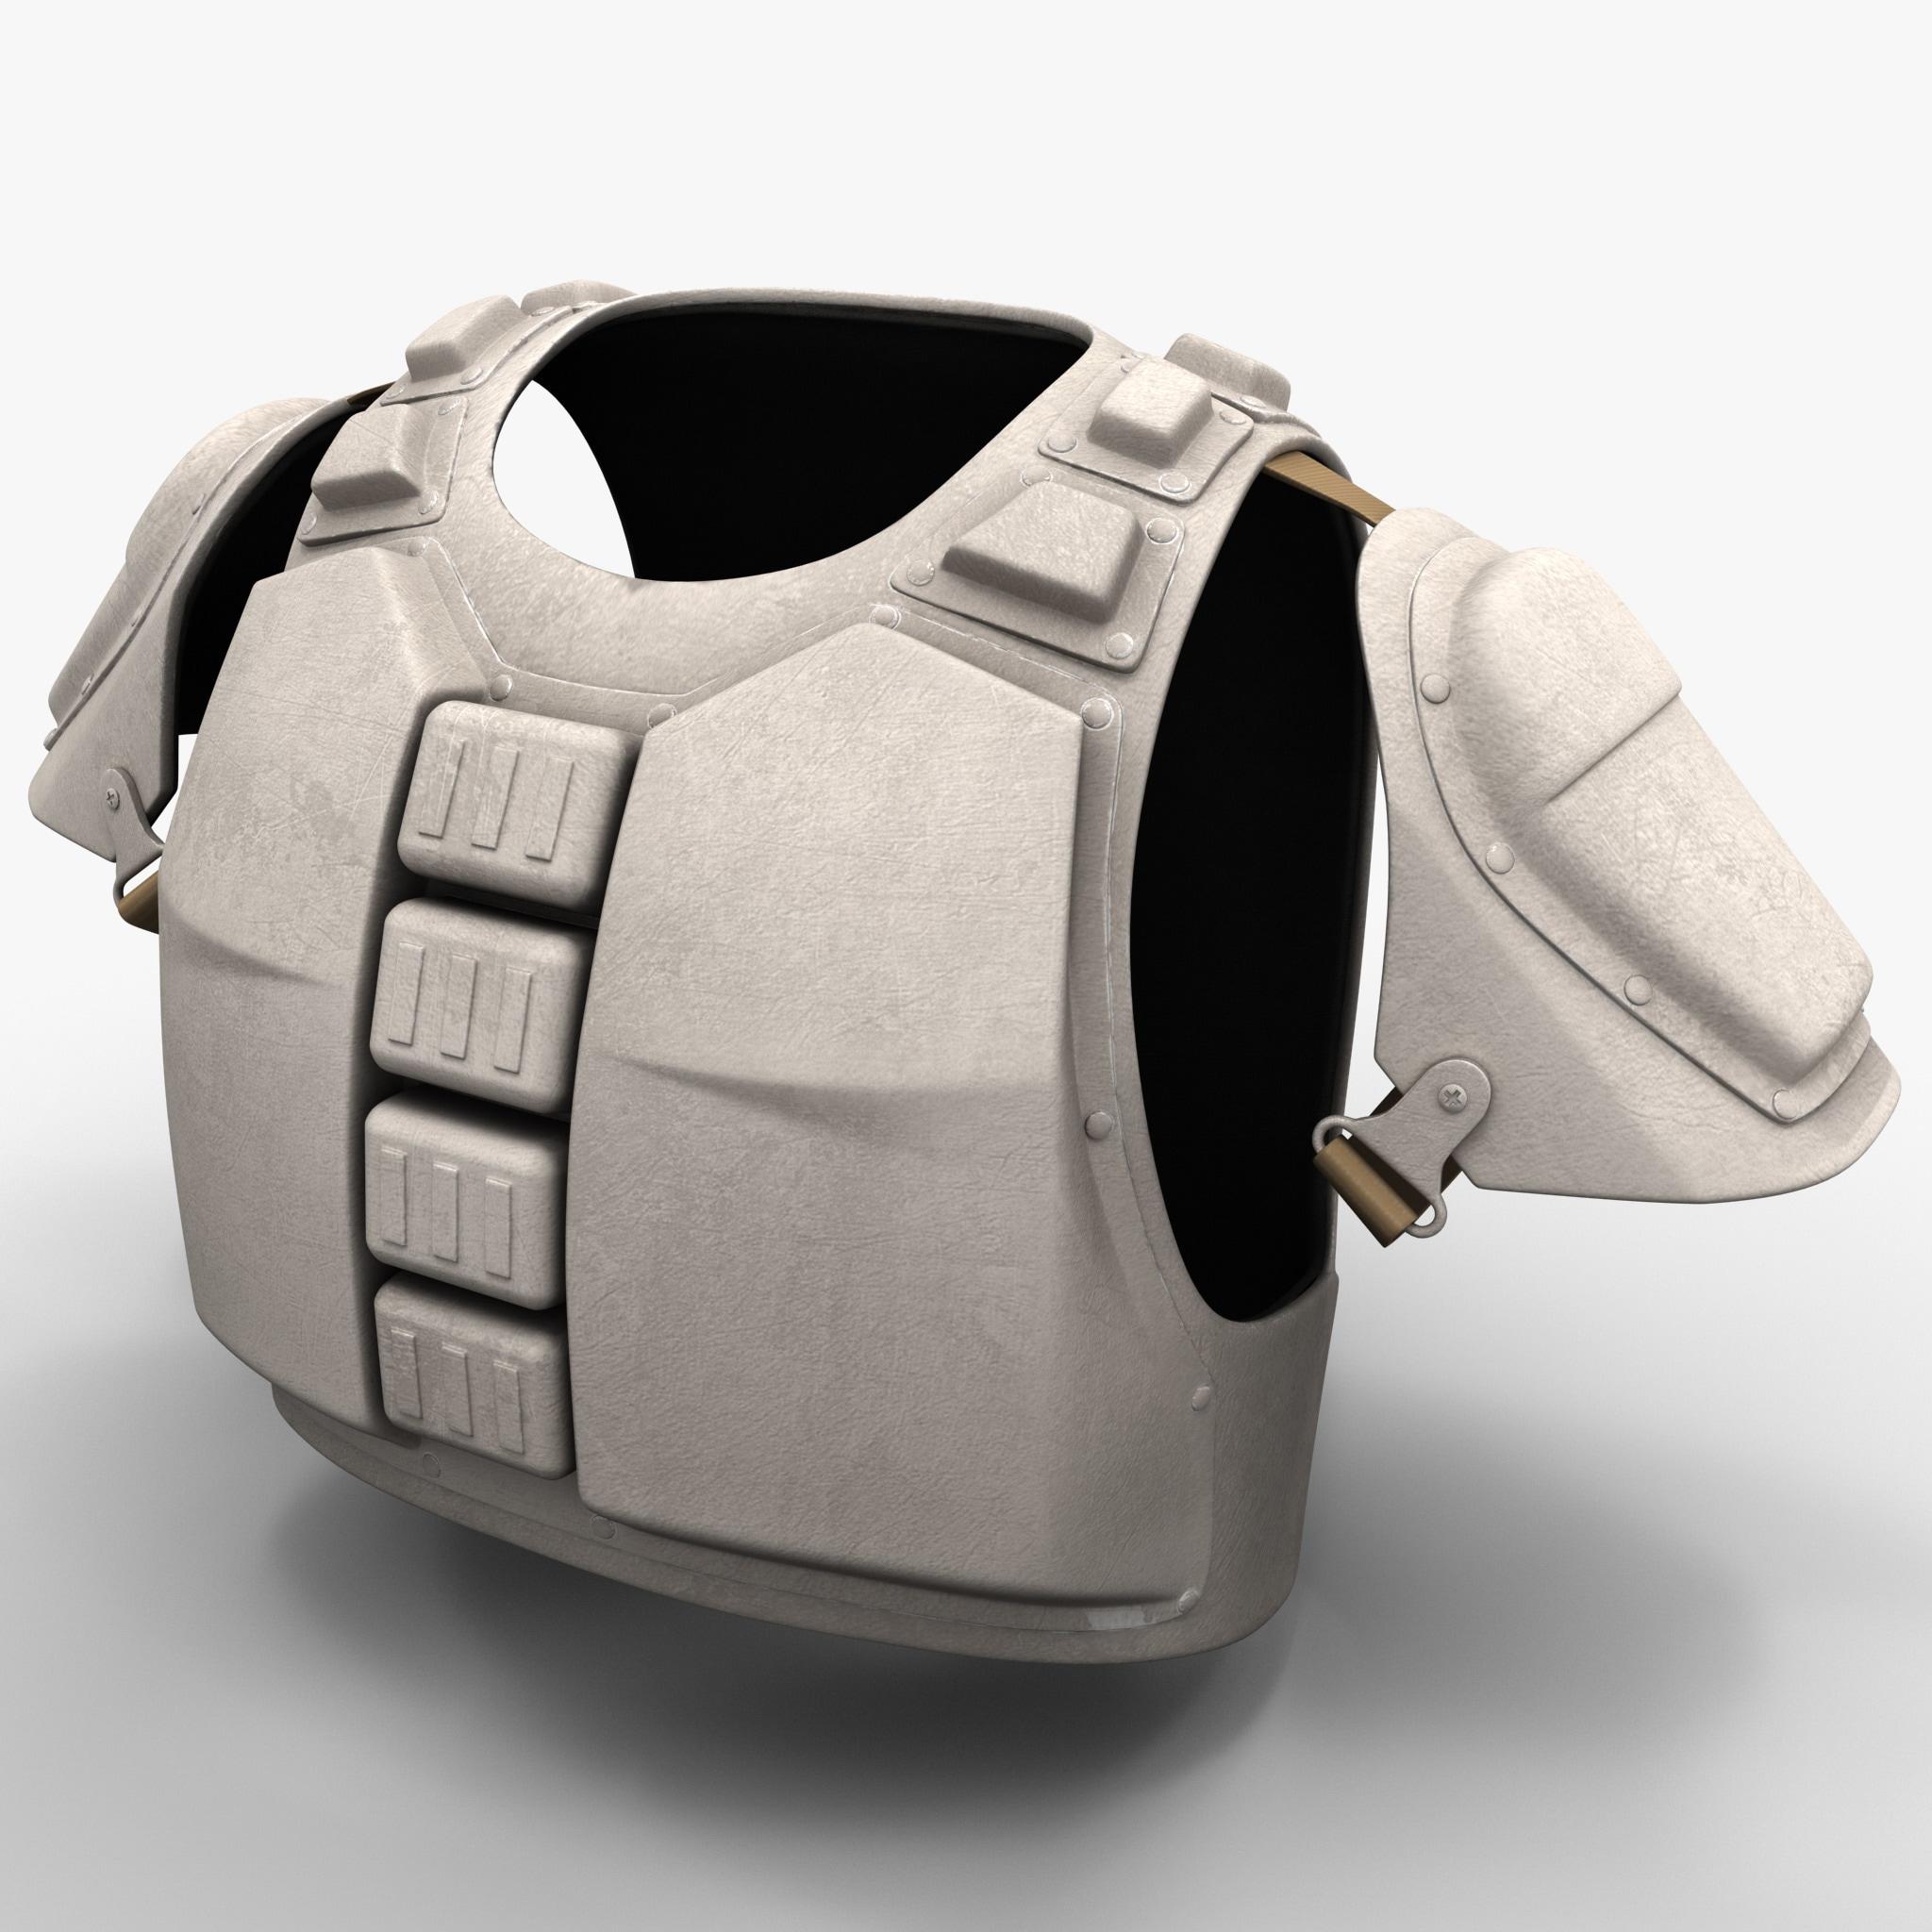 Futuristic Solider Armor_2.jpg